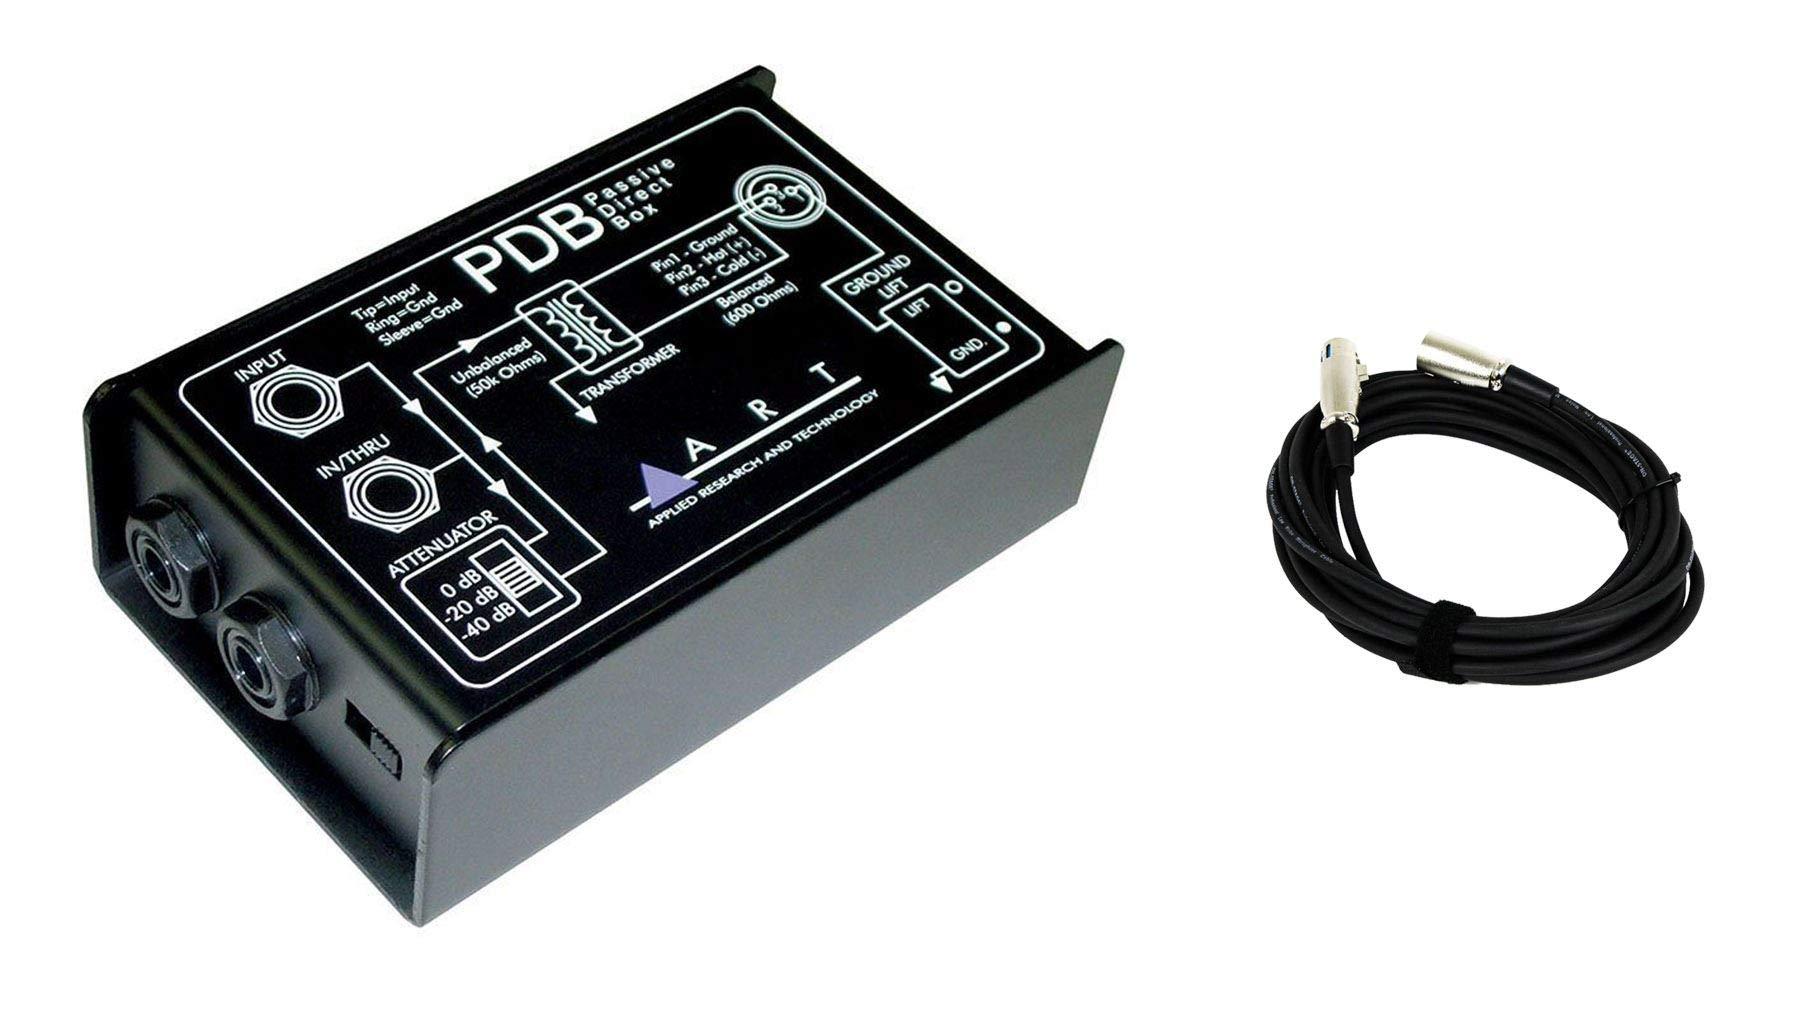 ART PDB Passive Direct Box Bundle with Bonus XLR Cable (2 Items) by ART (Image #1)